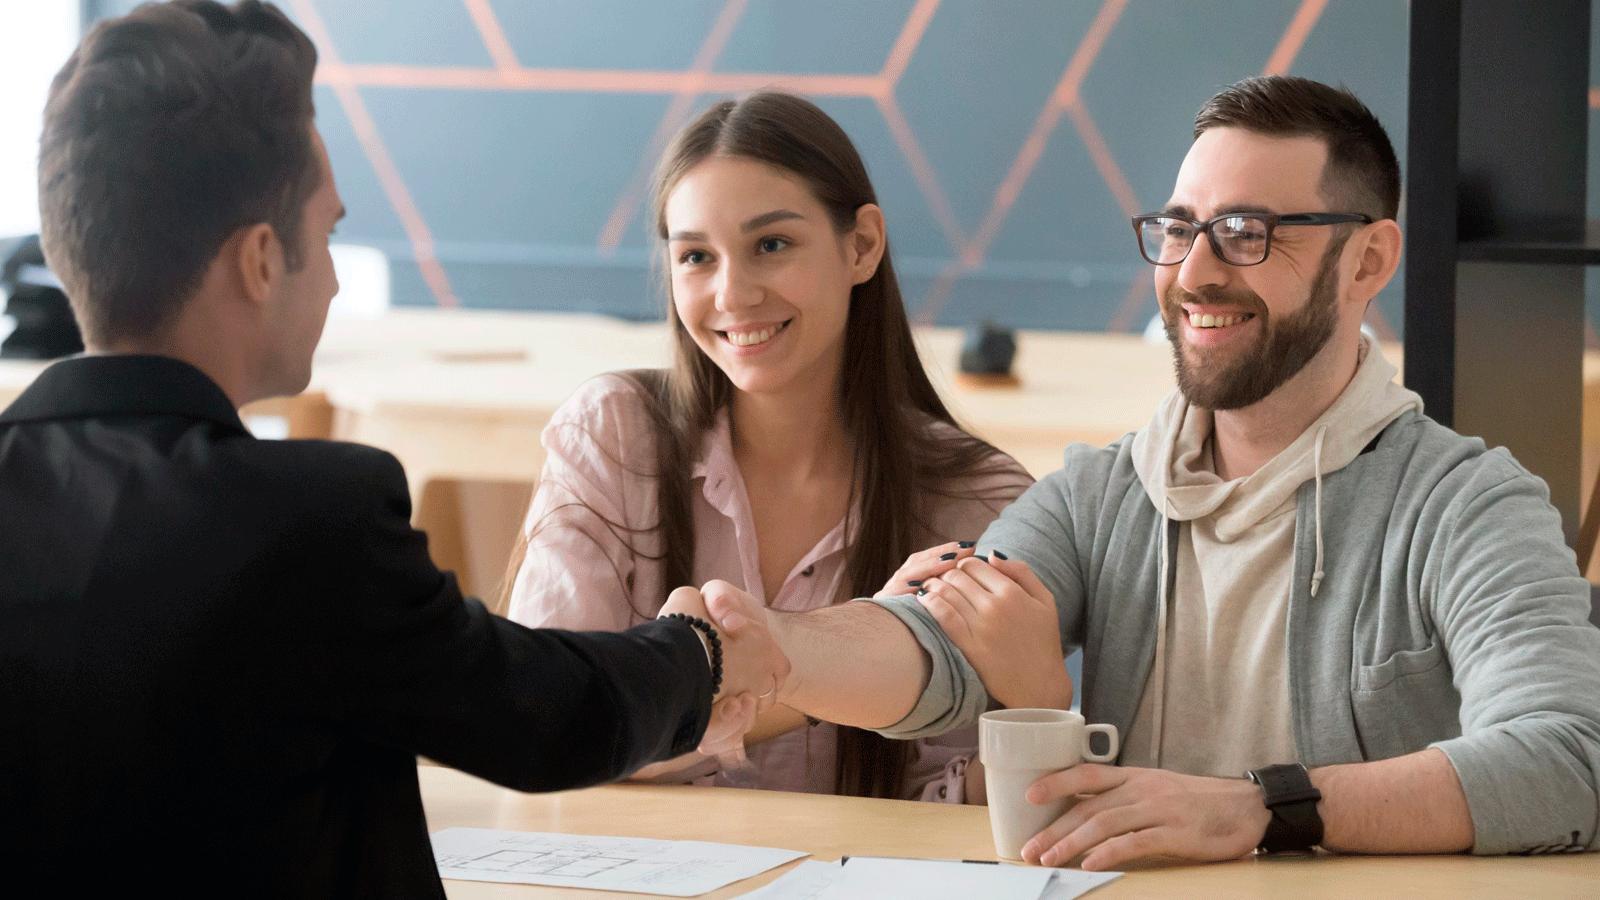 prestamos-hipotecarios-que-son-como-se-aplican